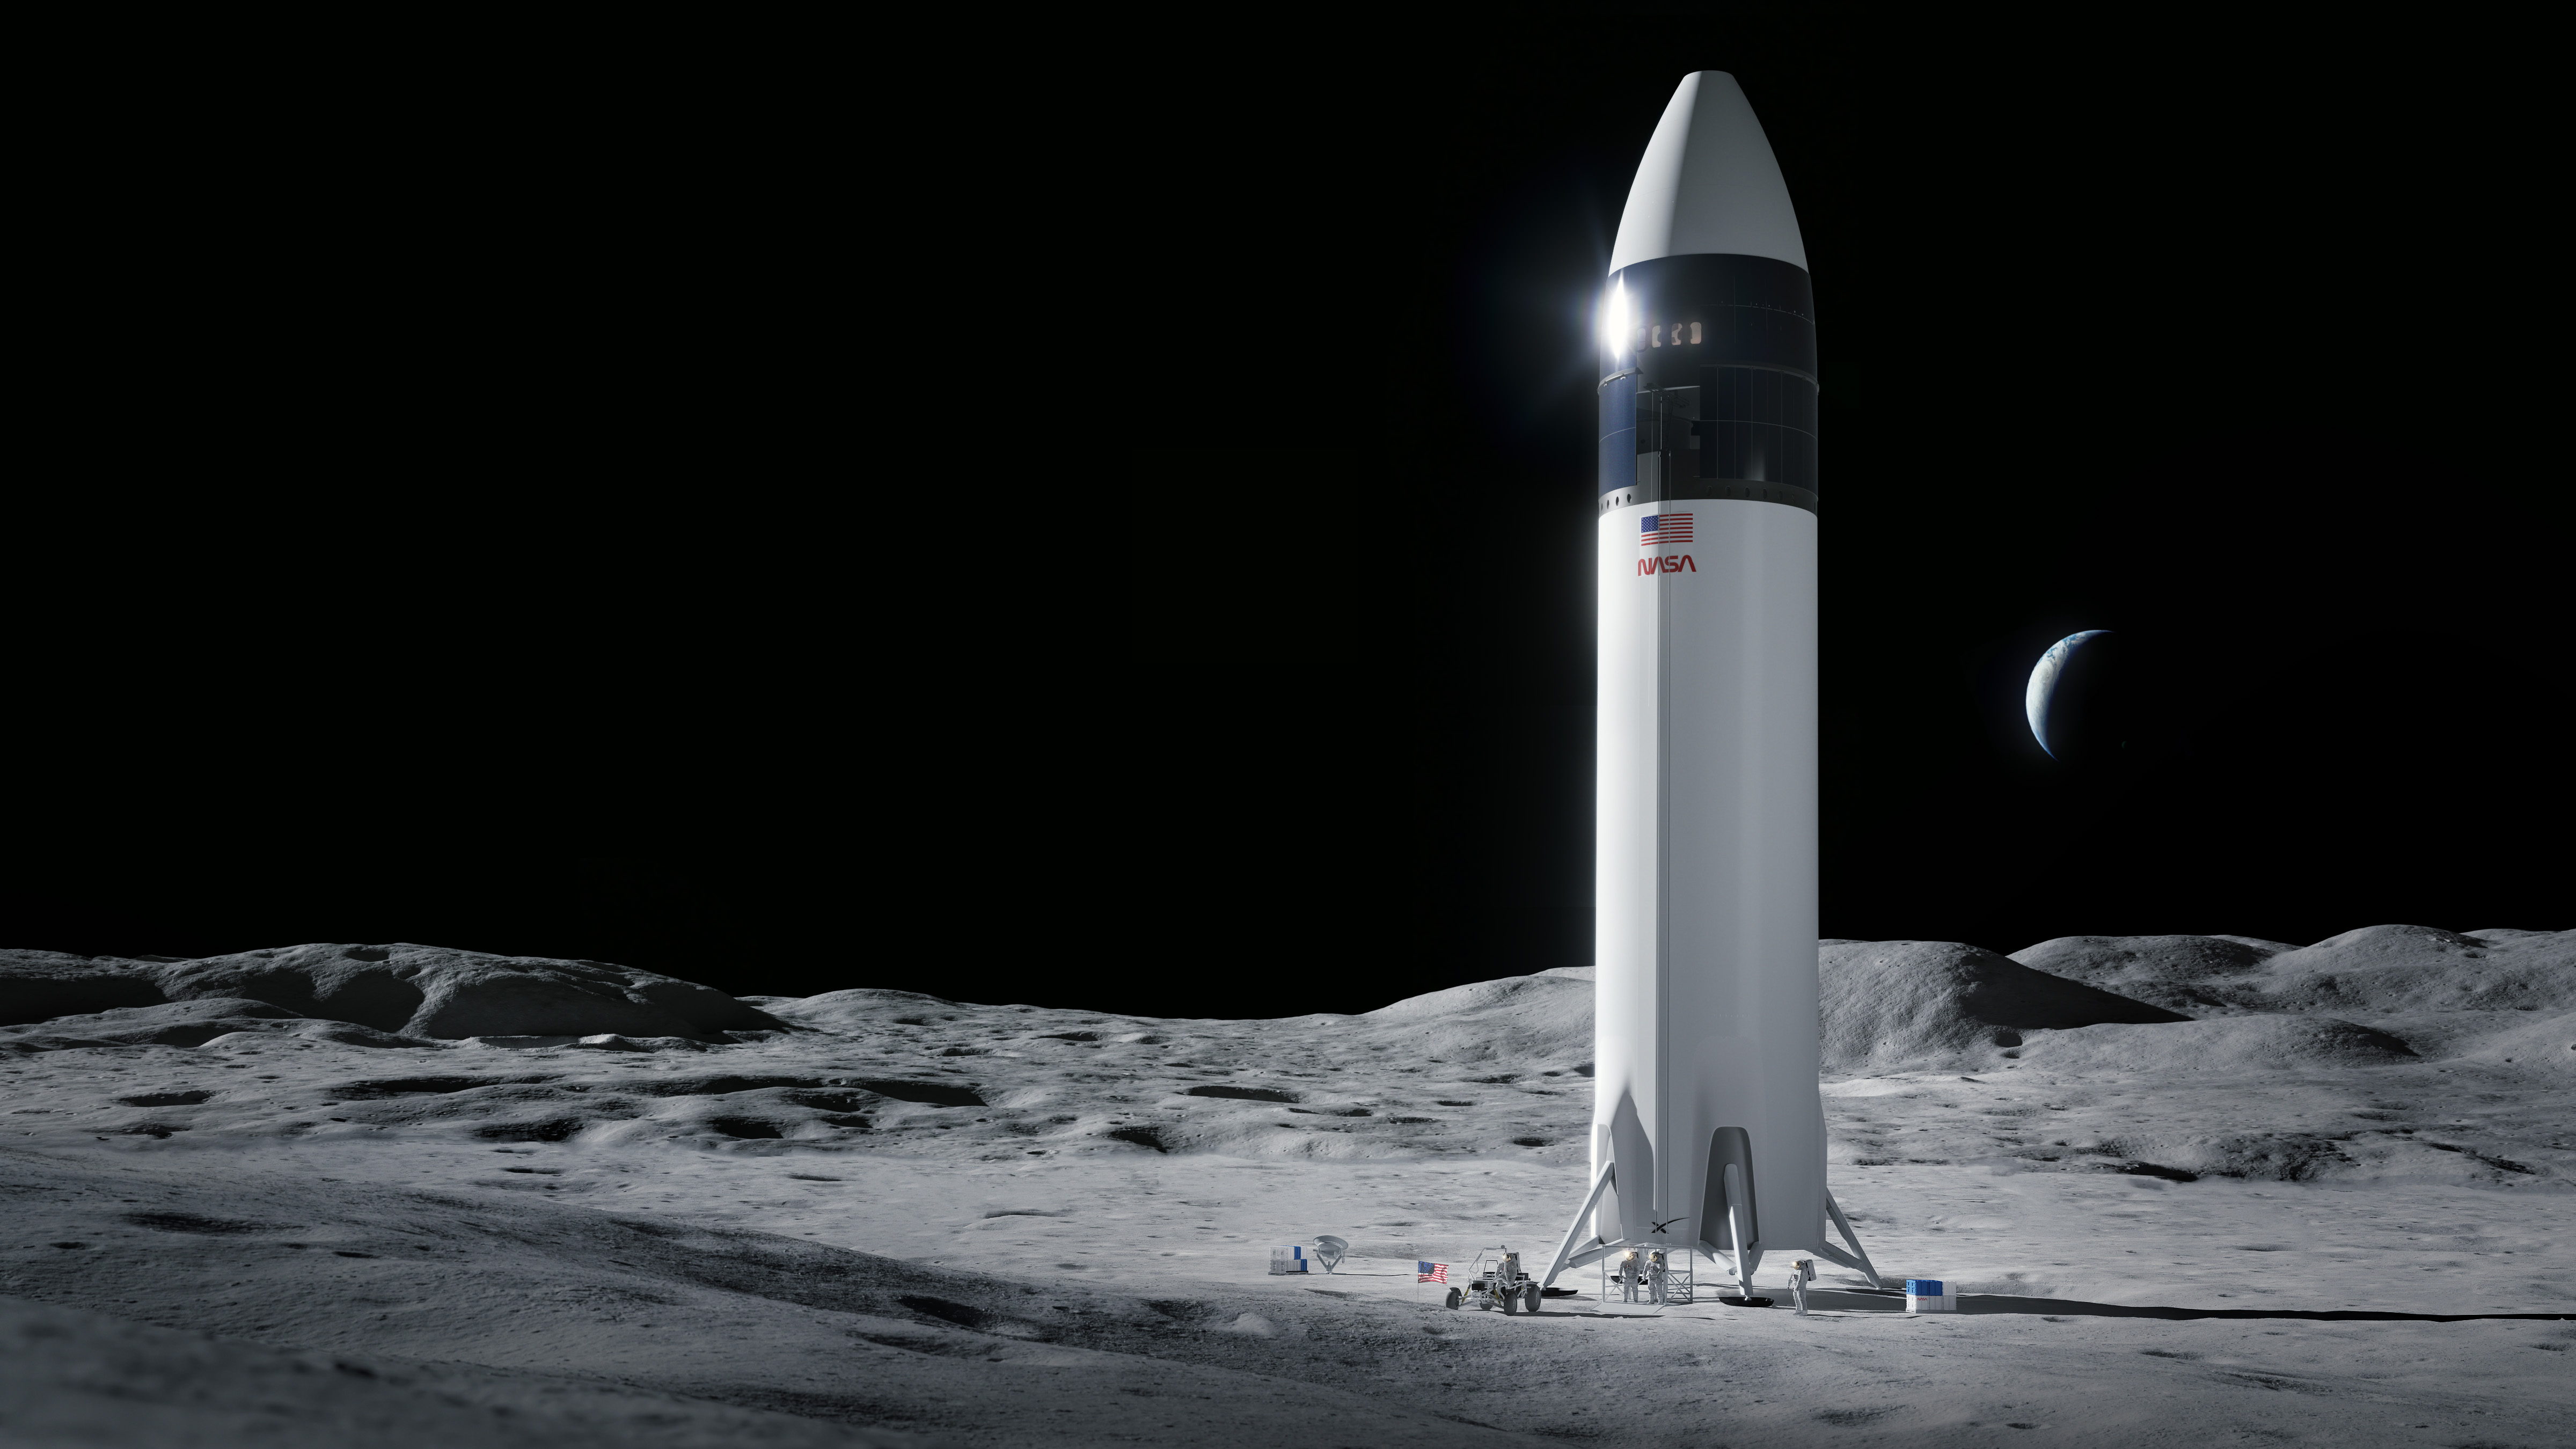 <p>Senate passes Enormous tech funding bill, includes $10 billion for NASA moon landers thumbnail